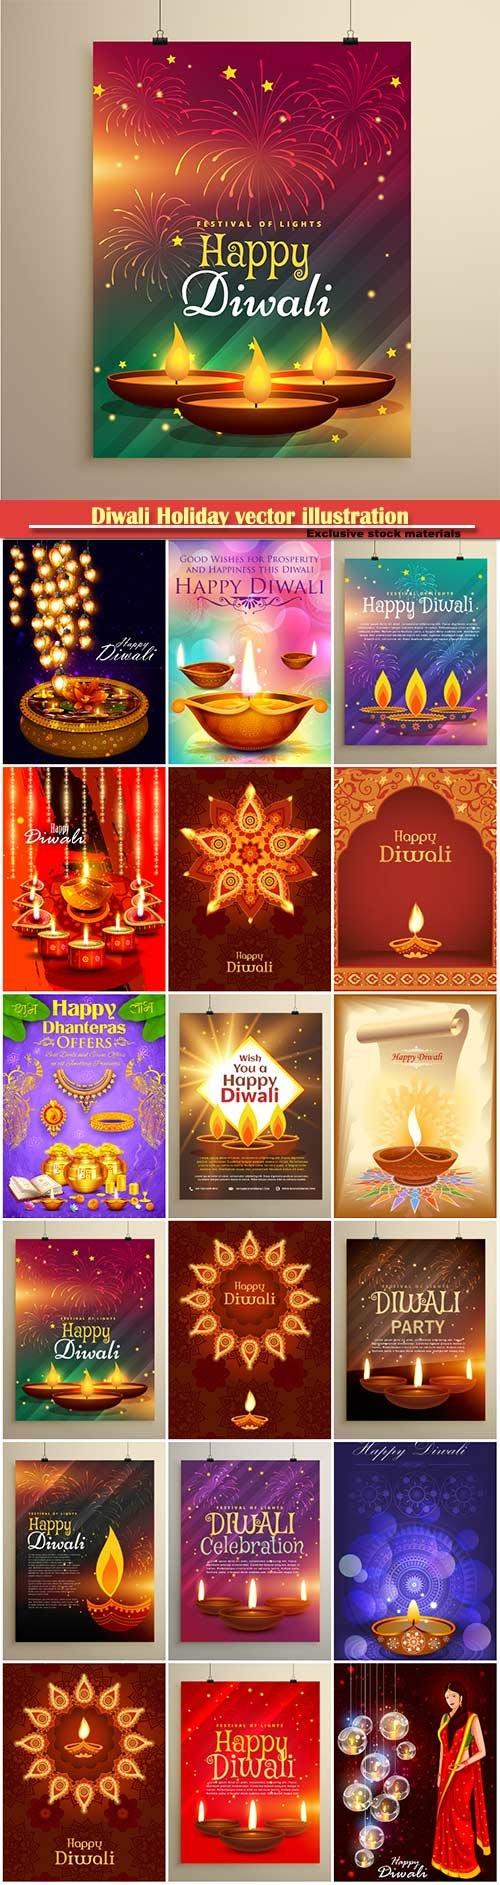 Diwali Holiday vector illustration with burning diya # 4